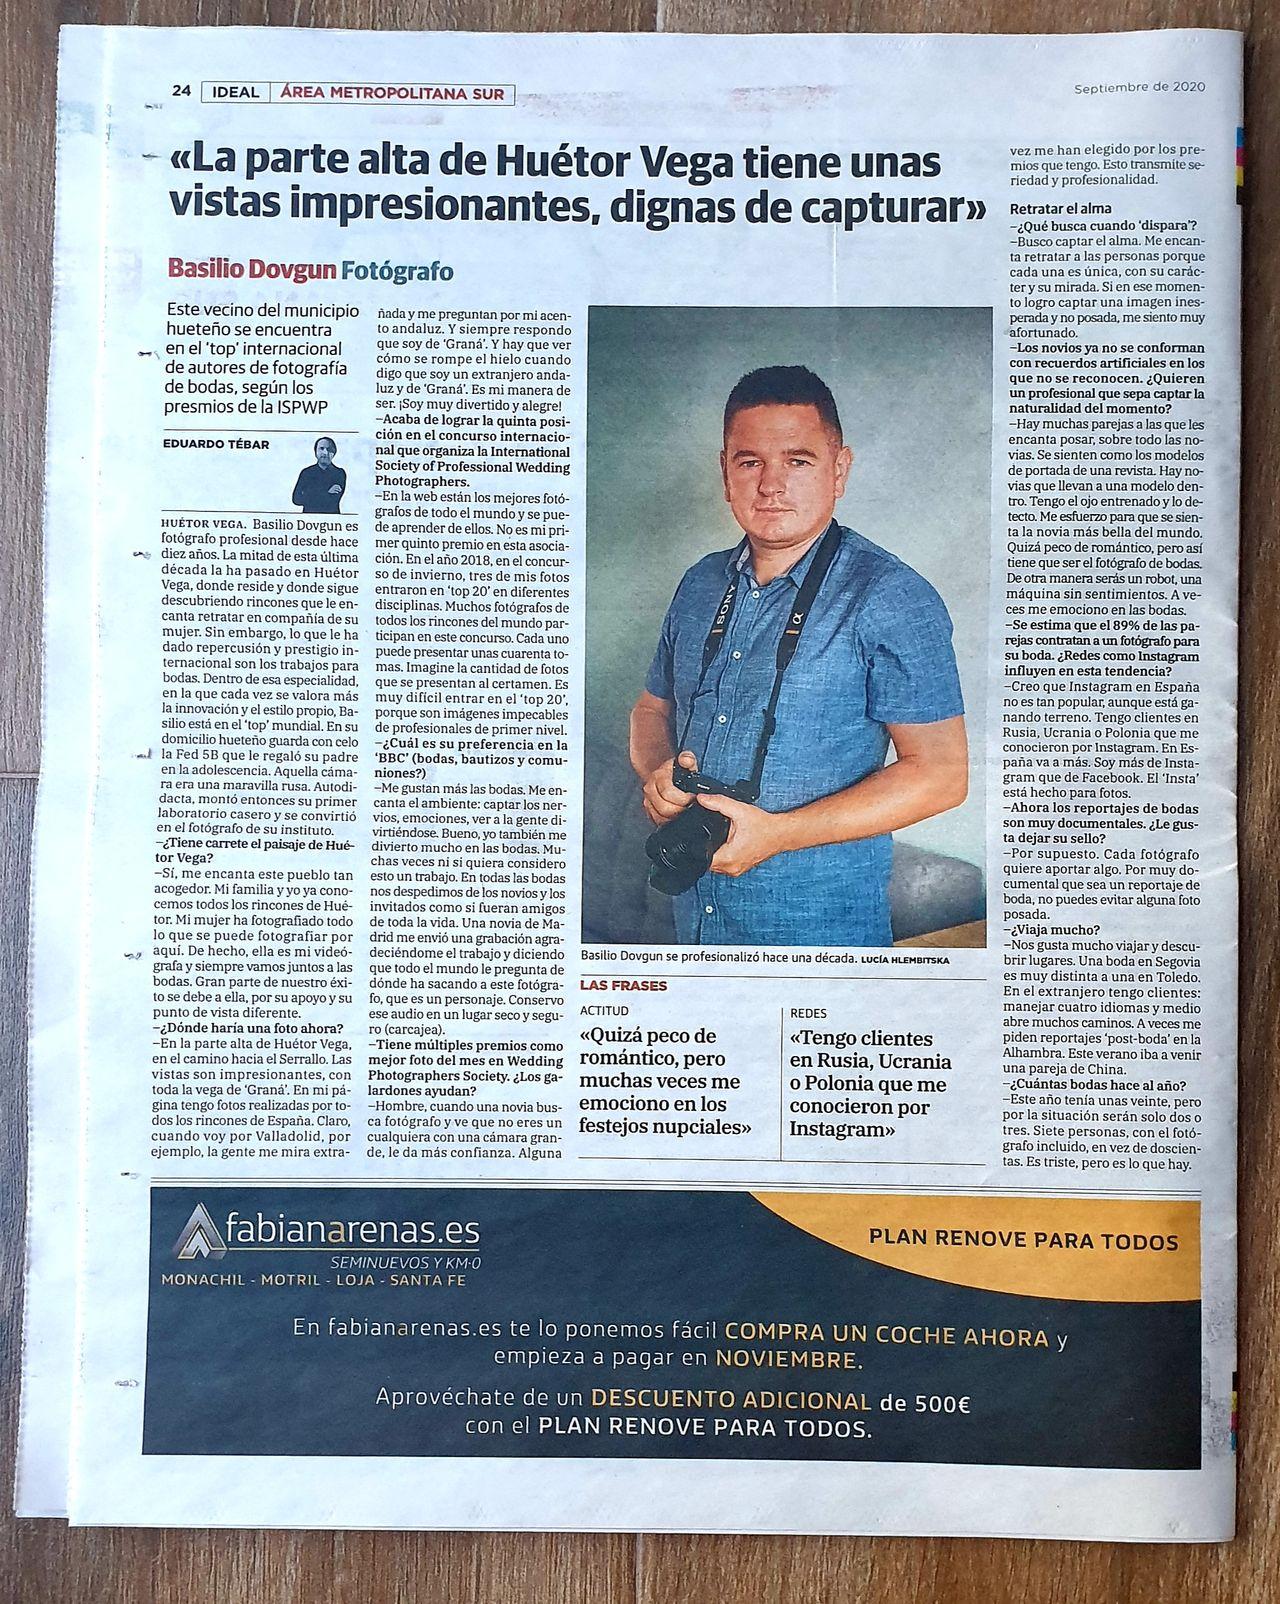 Basilio Dovgun de WedFotoNet en la prensa